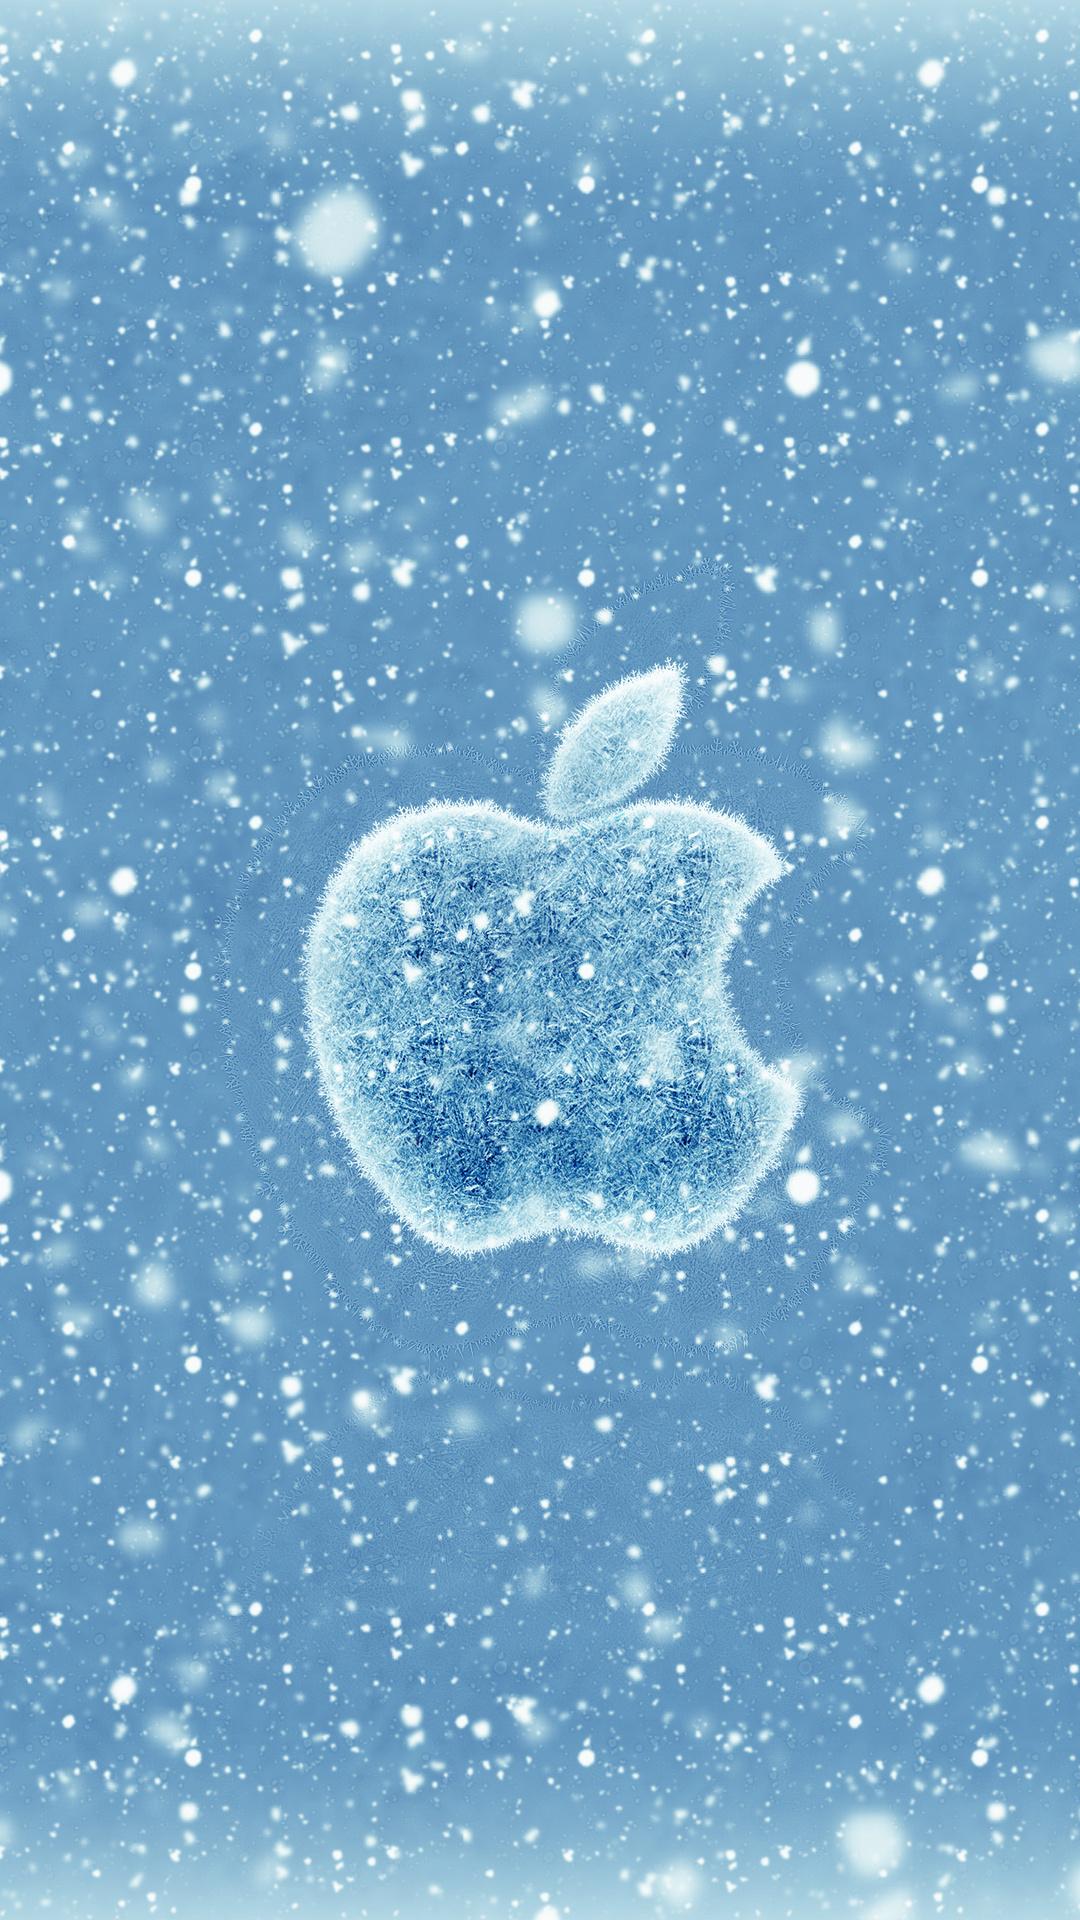 apple-christmas-winter-logo-4k-qf.jpg